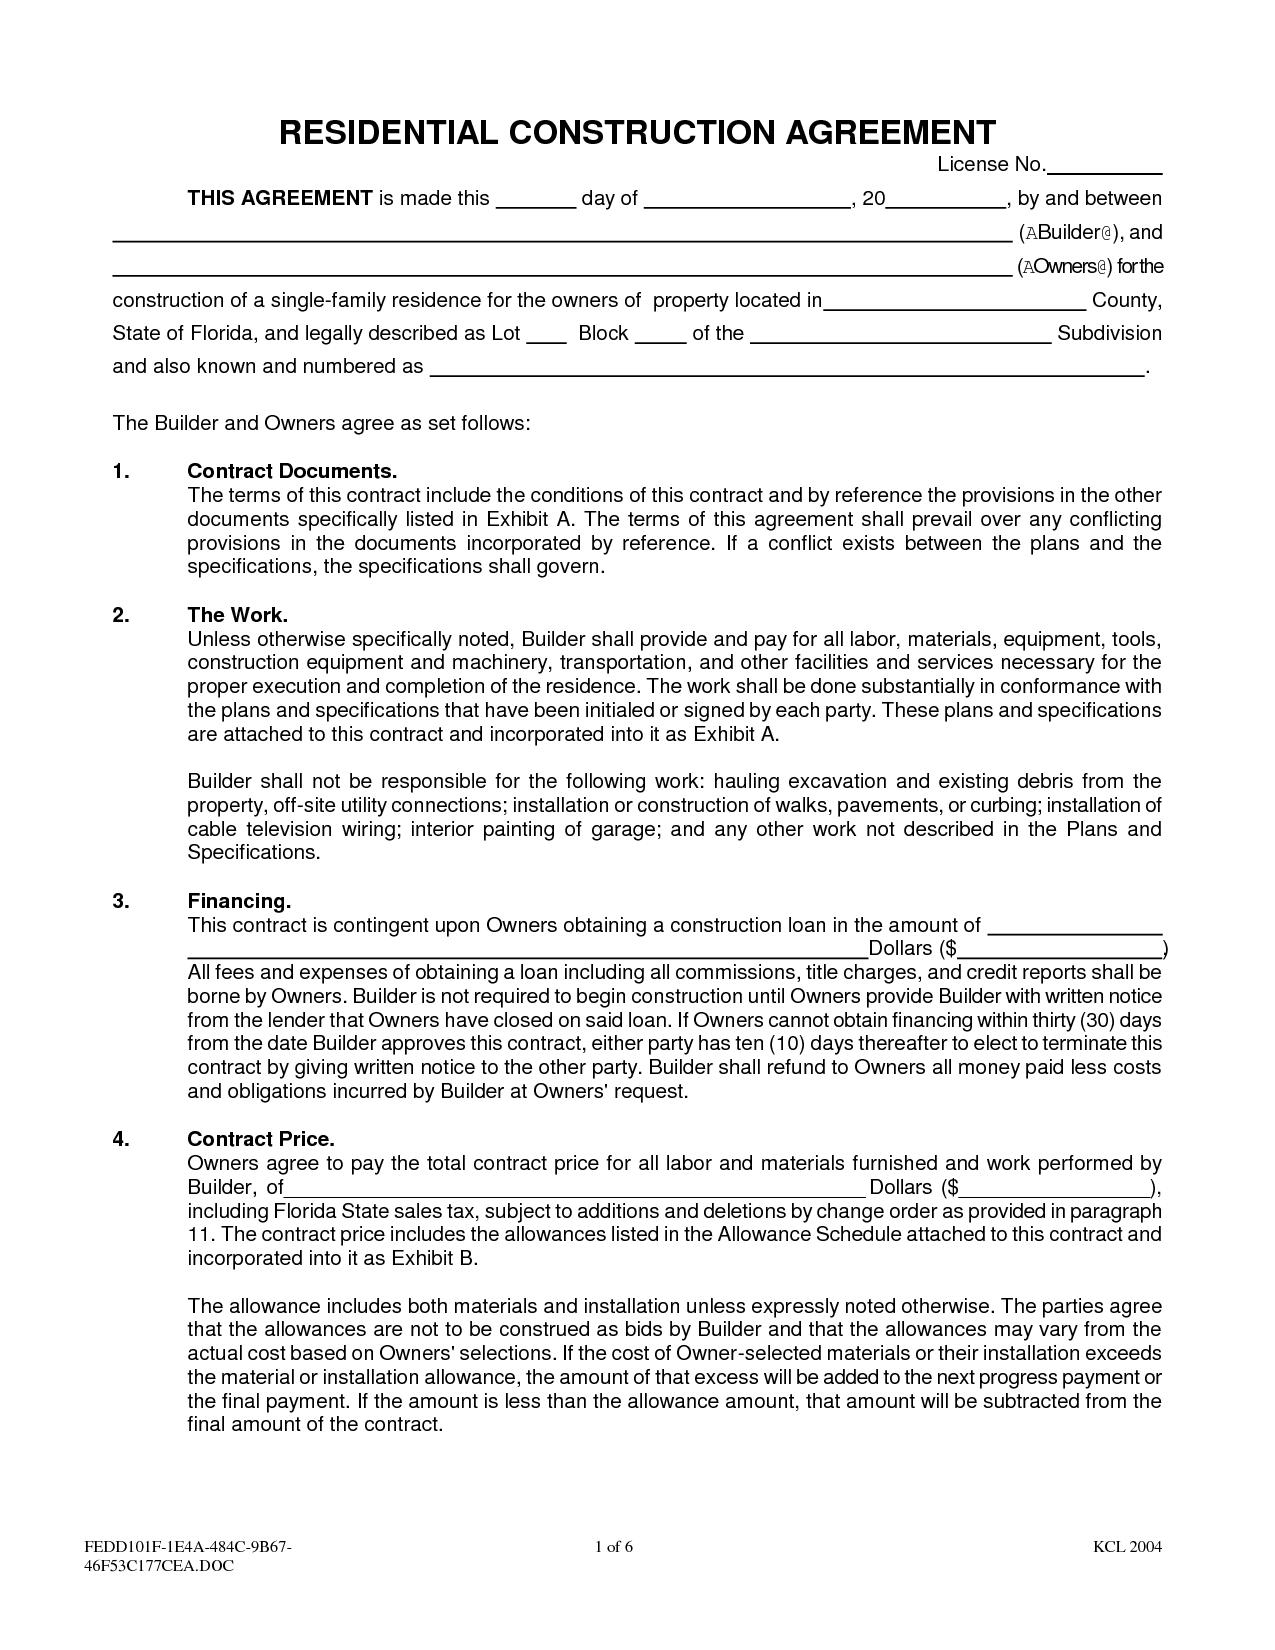 interior design contract agreement